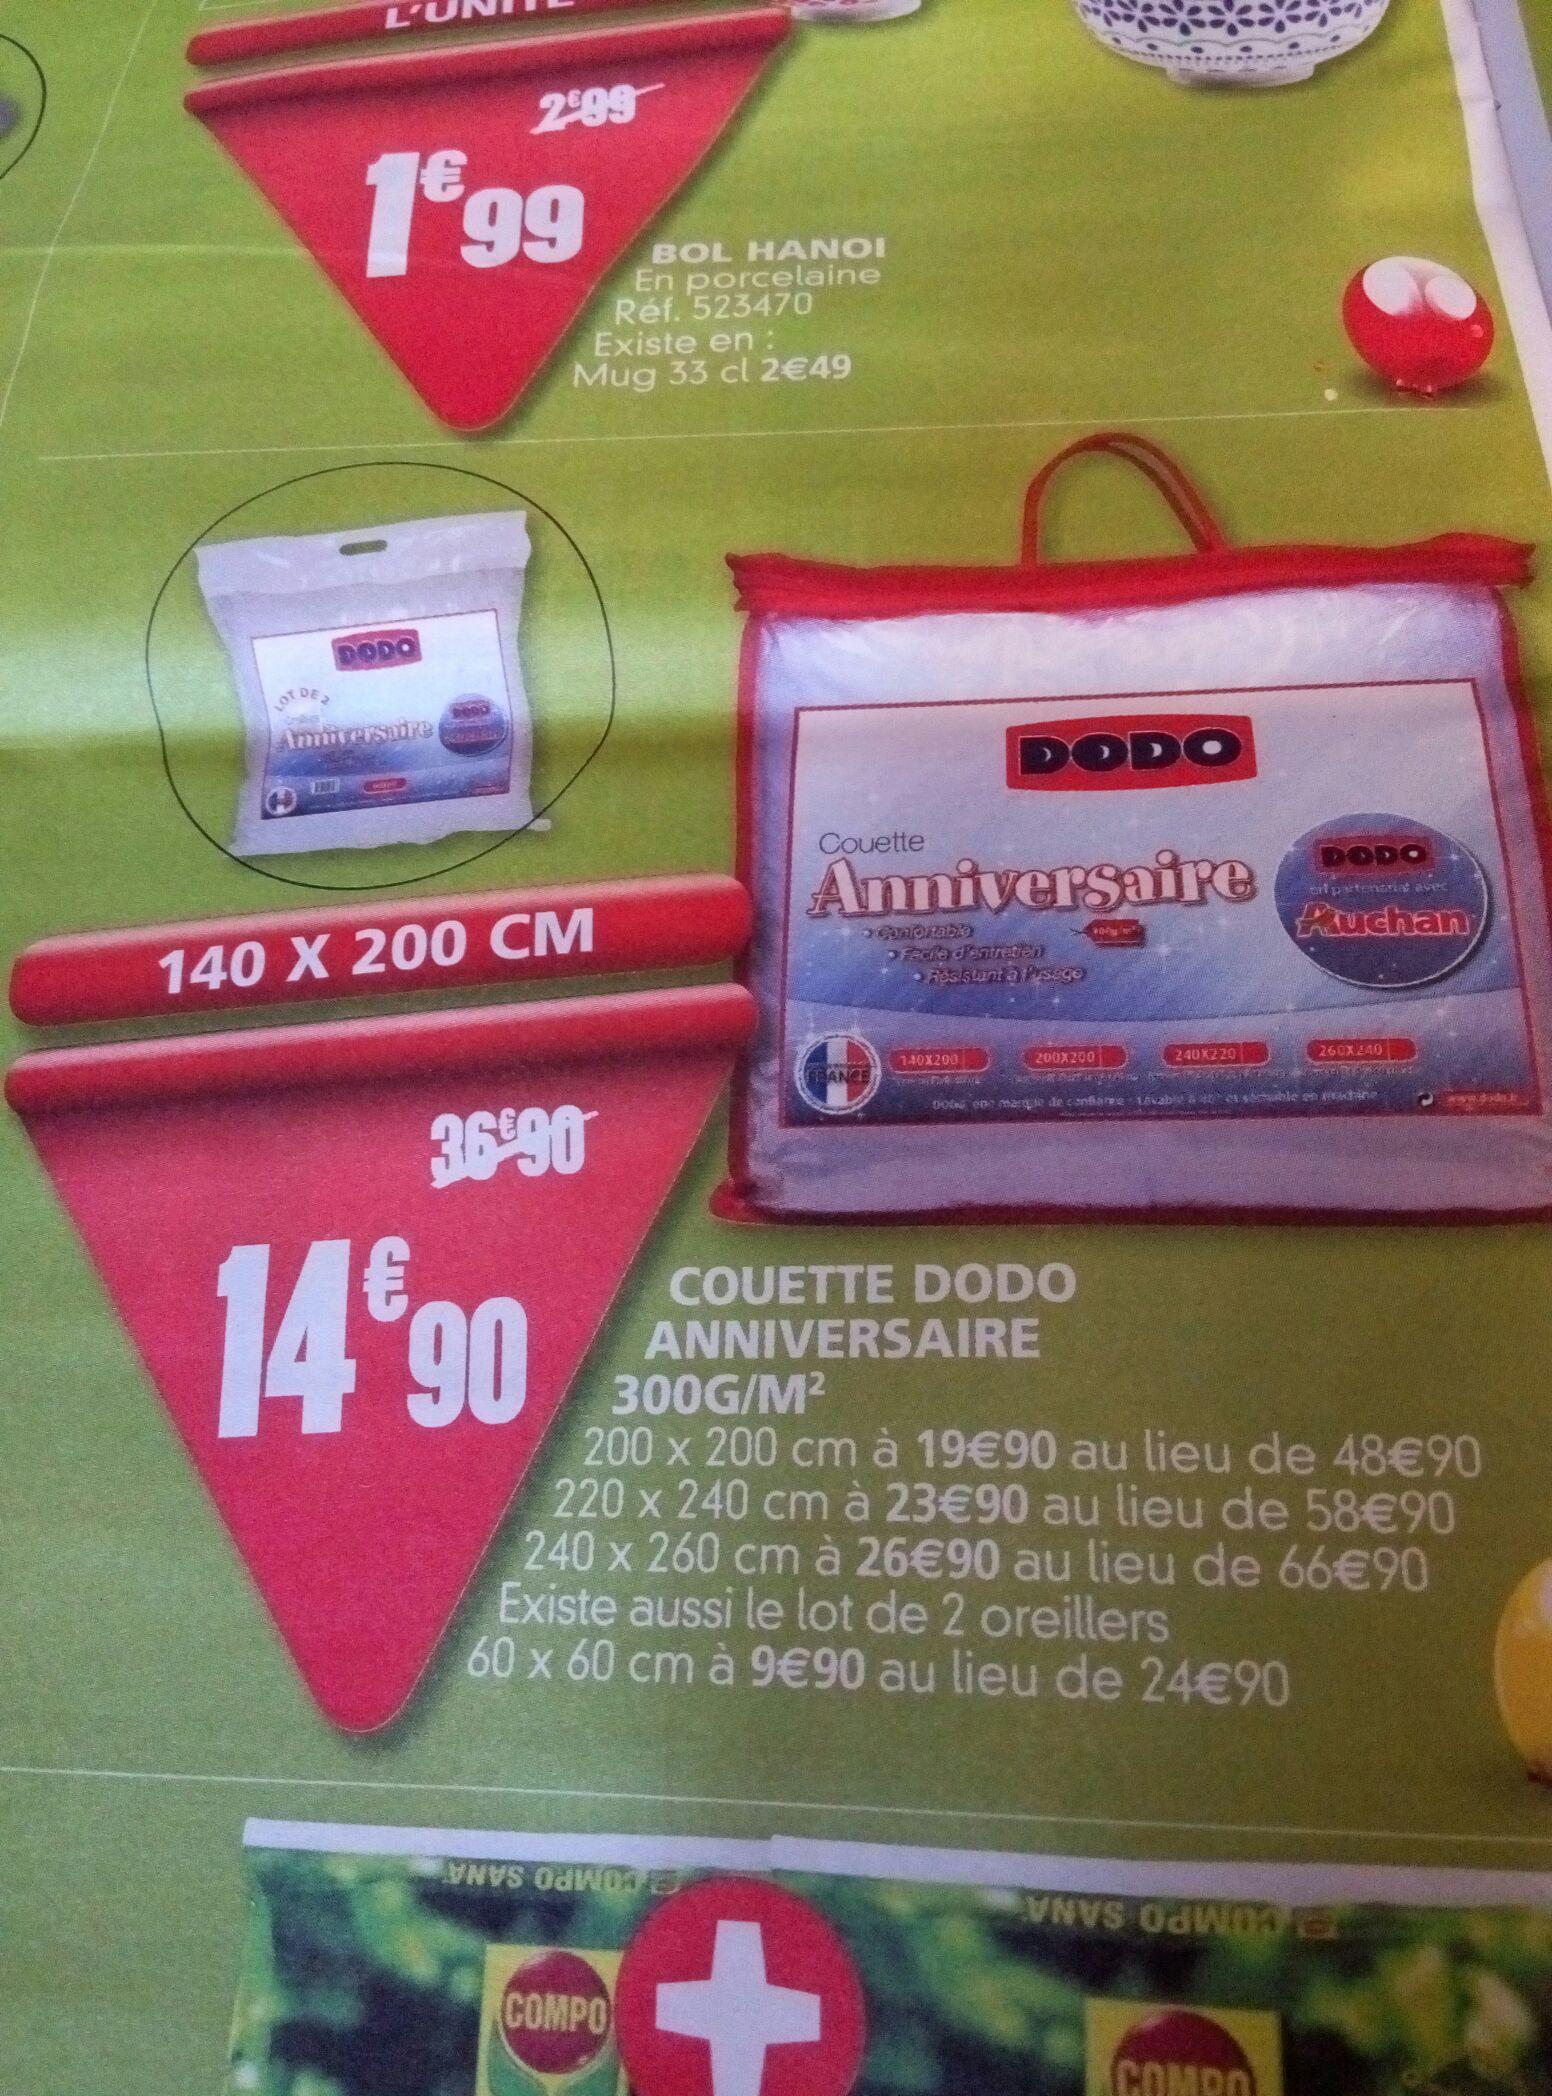 Couette Dodo 300g/m2 - Diverses tailles - Ex : Taille 140x200cm